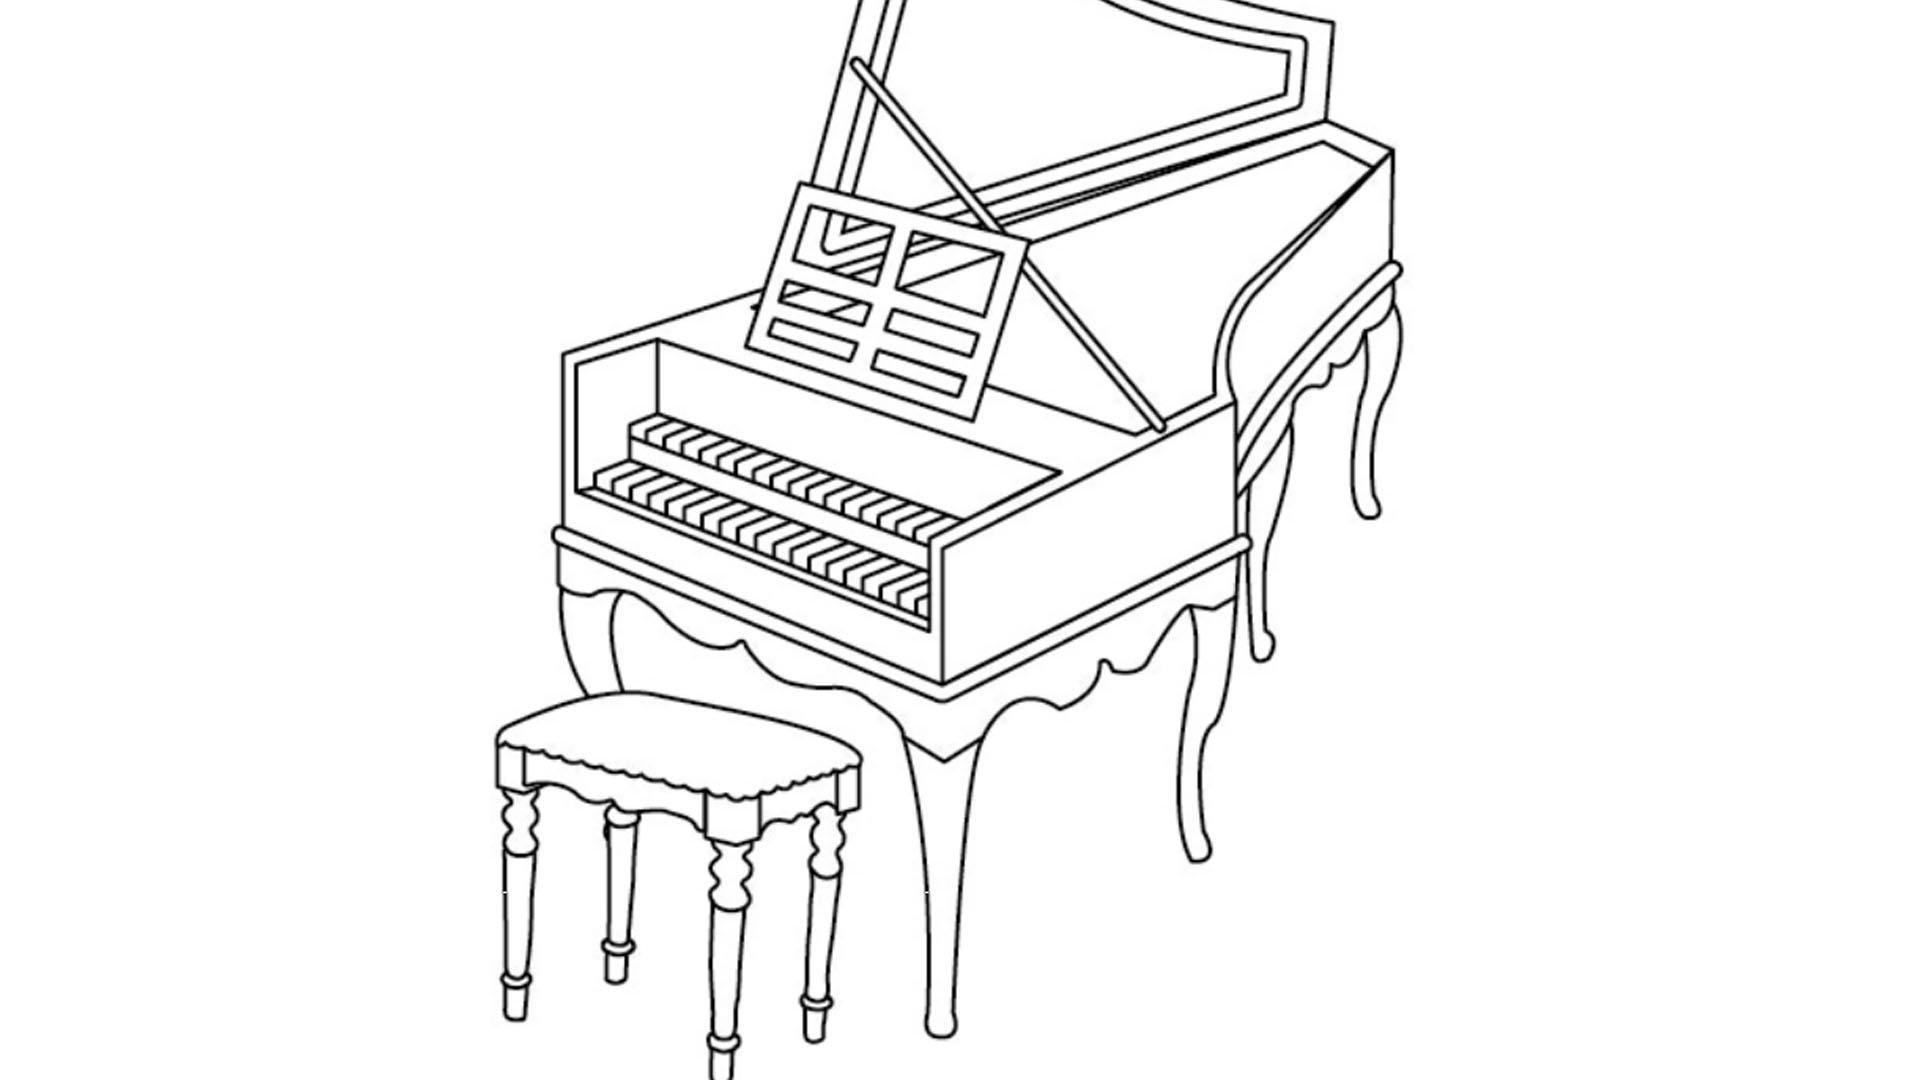 Diythumb klavier